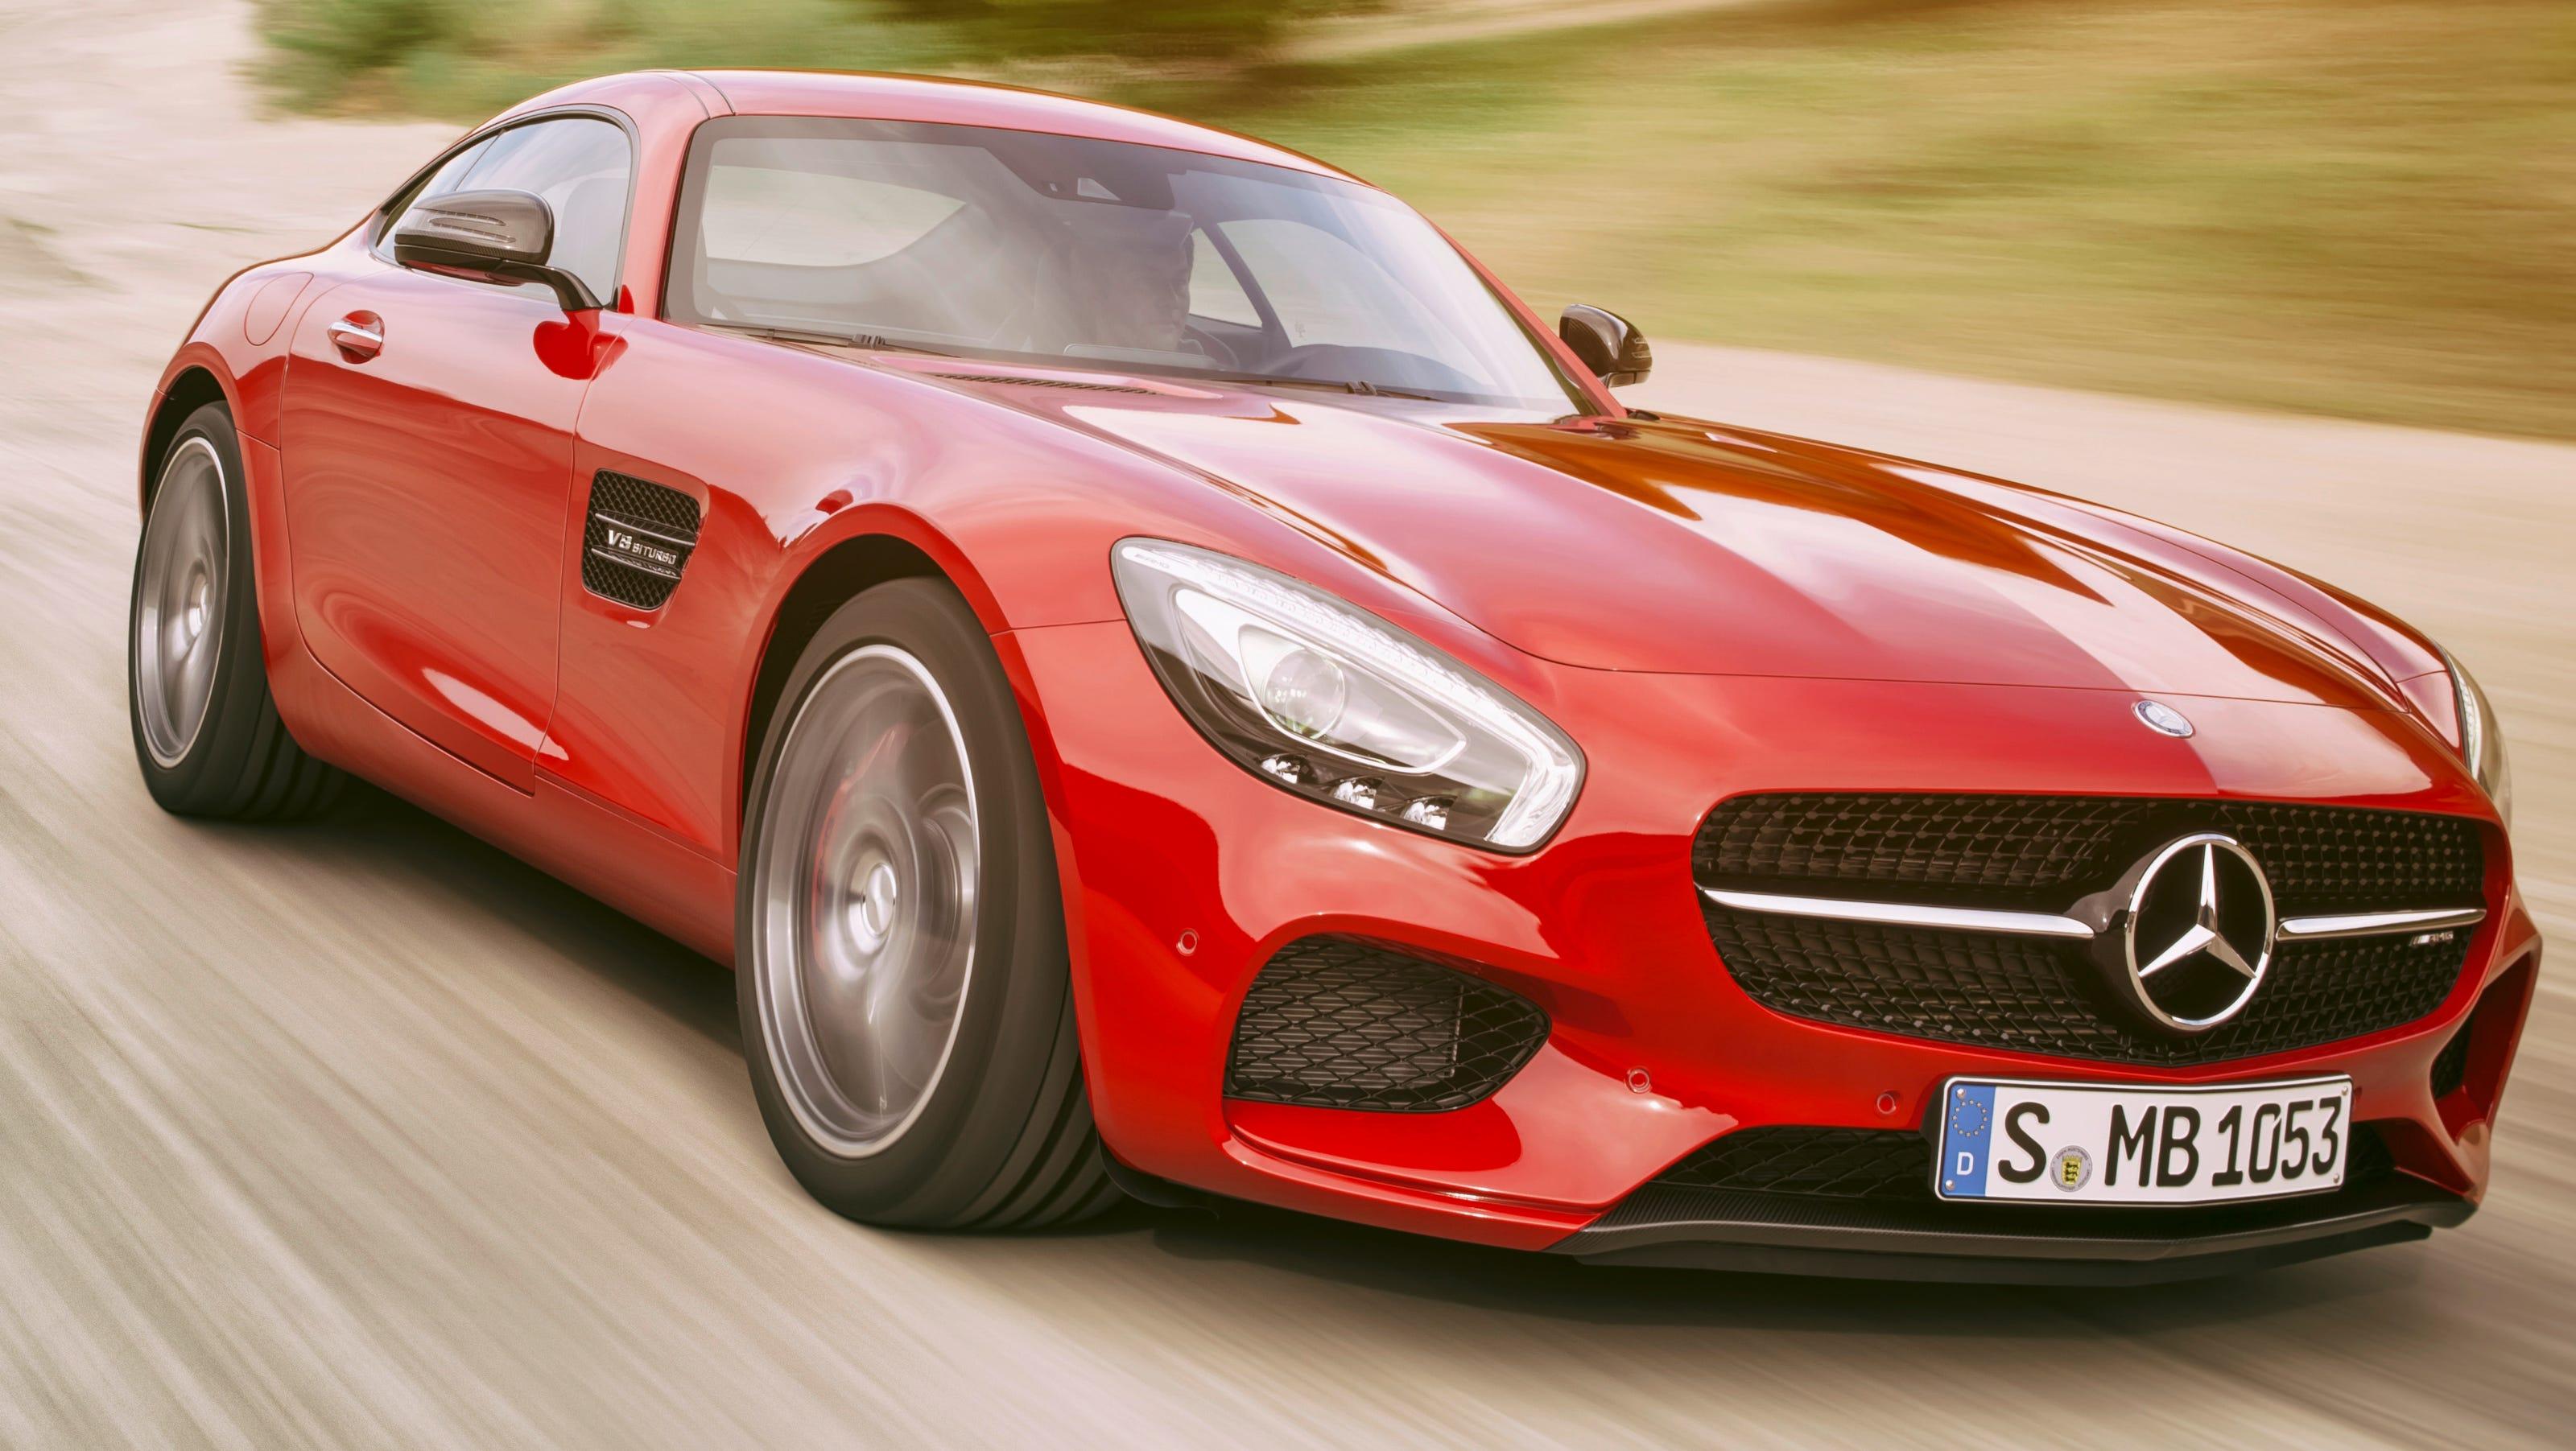 Mercedes benz launches hot 120k amg gt sports car for Sport mercedes benz new car